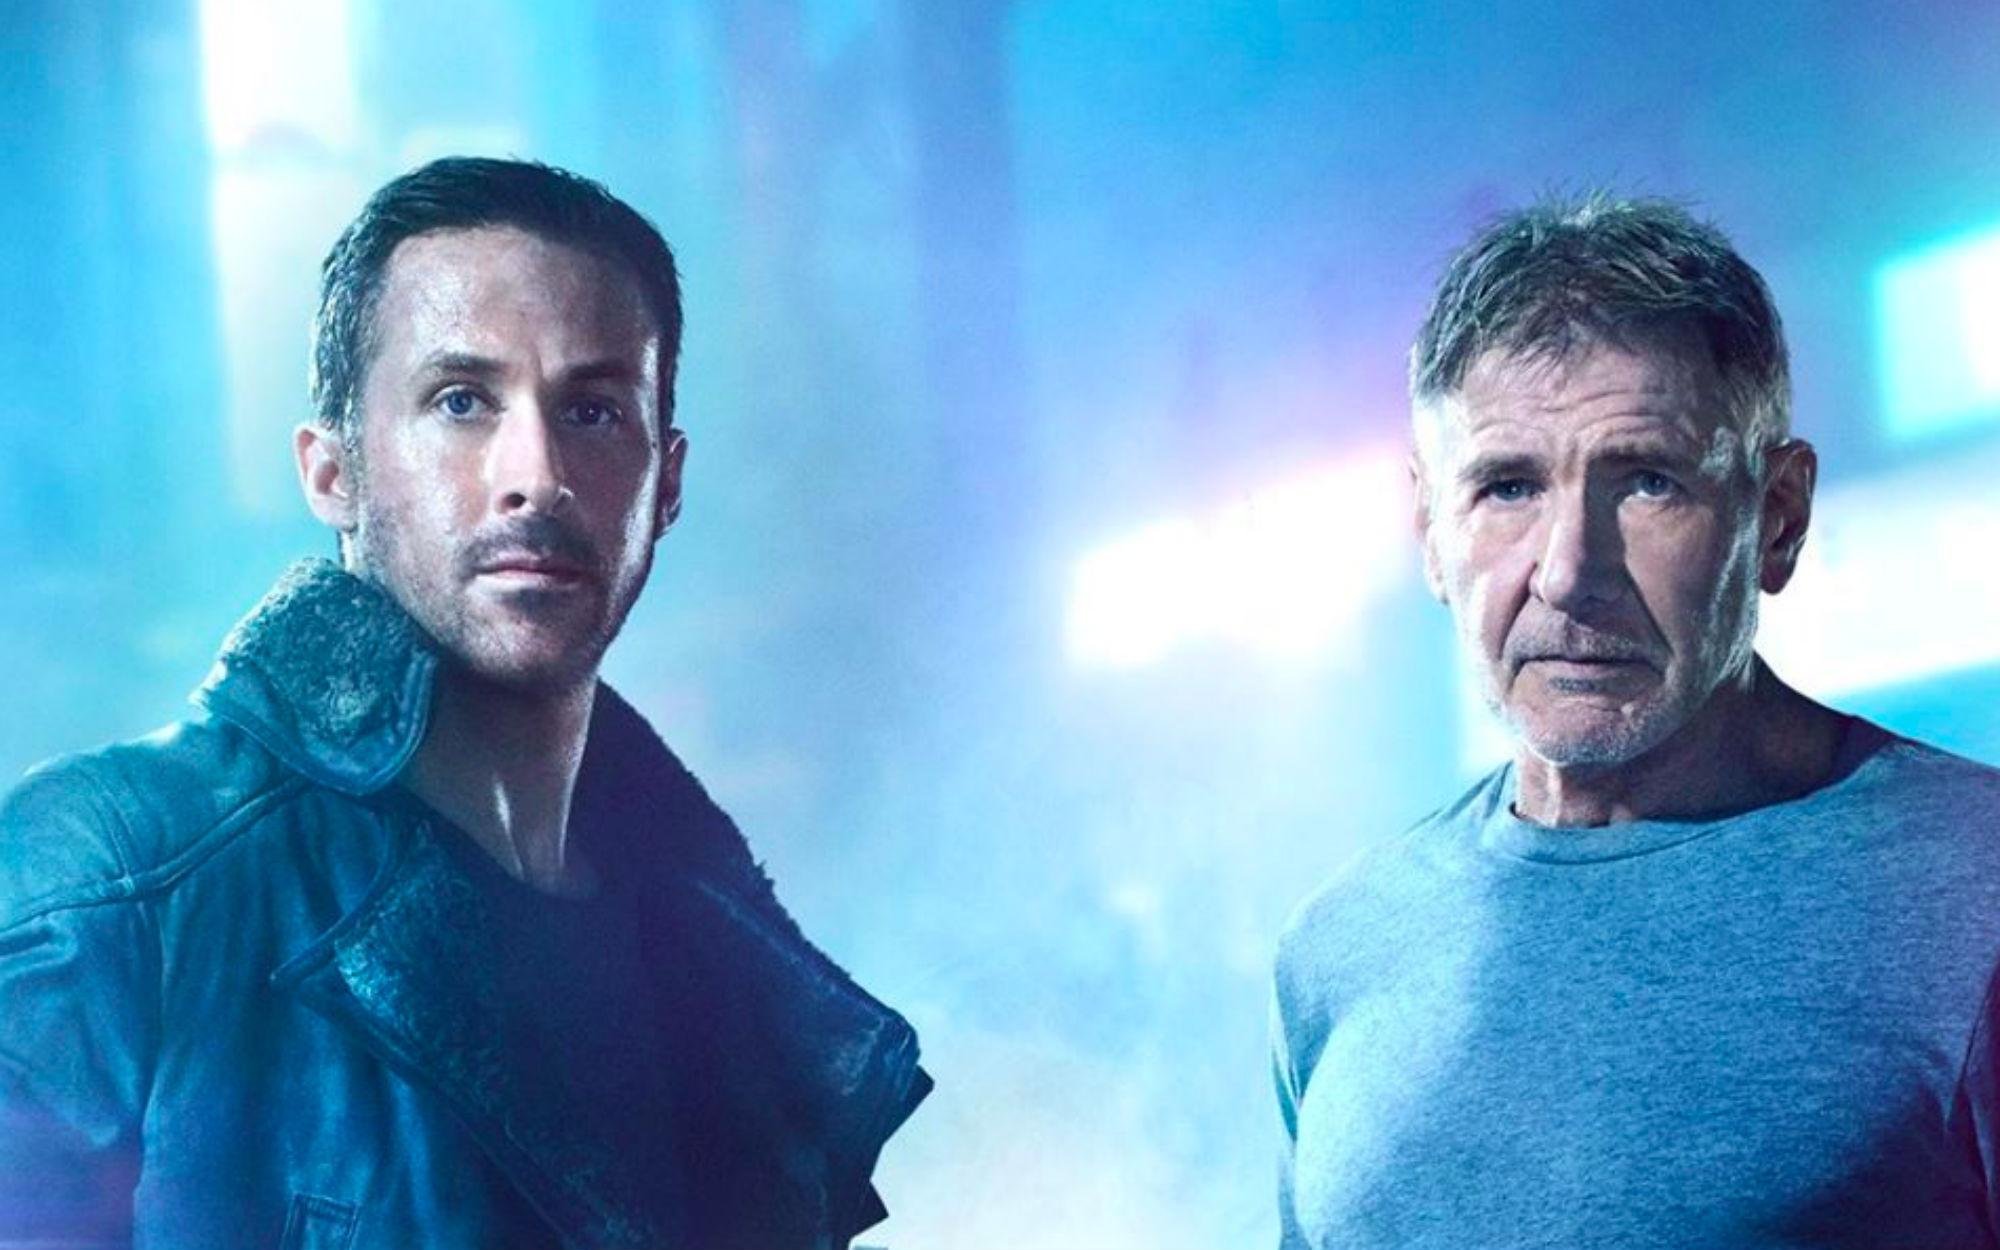 Watch Full Blade Runner 2049 (2017) Movies Trailer at online.movieonrails.com